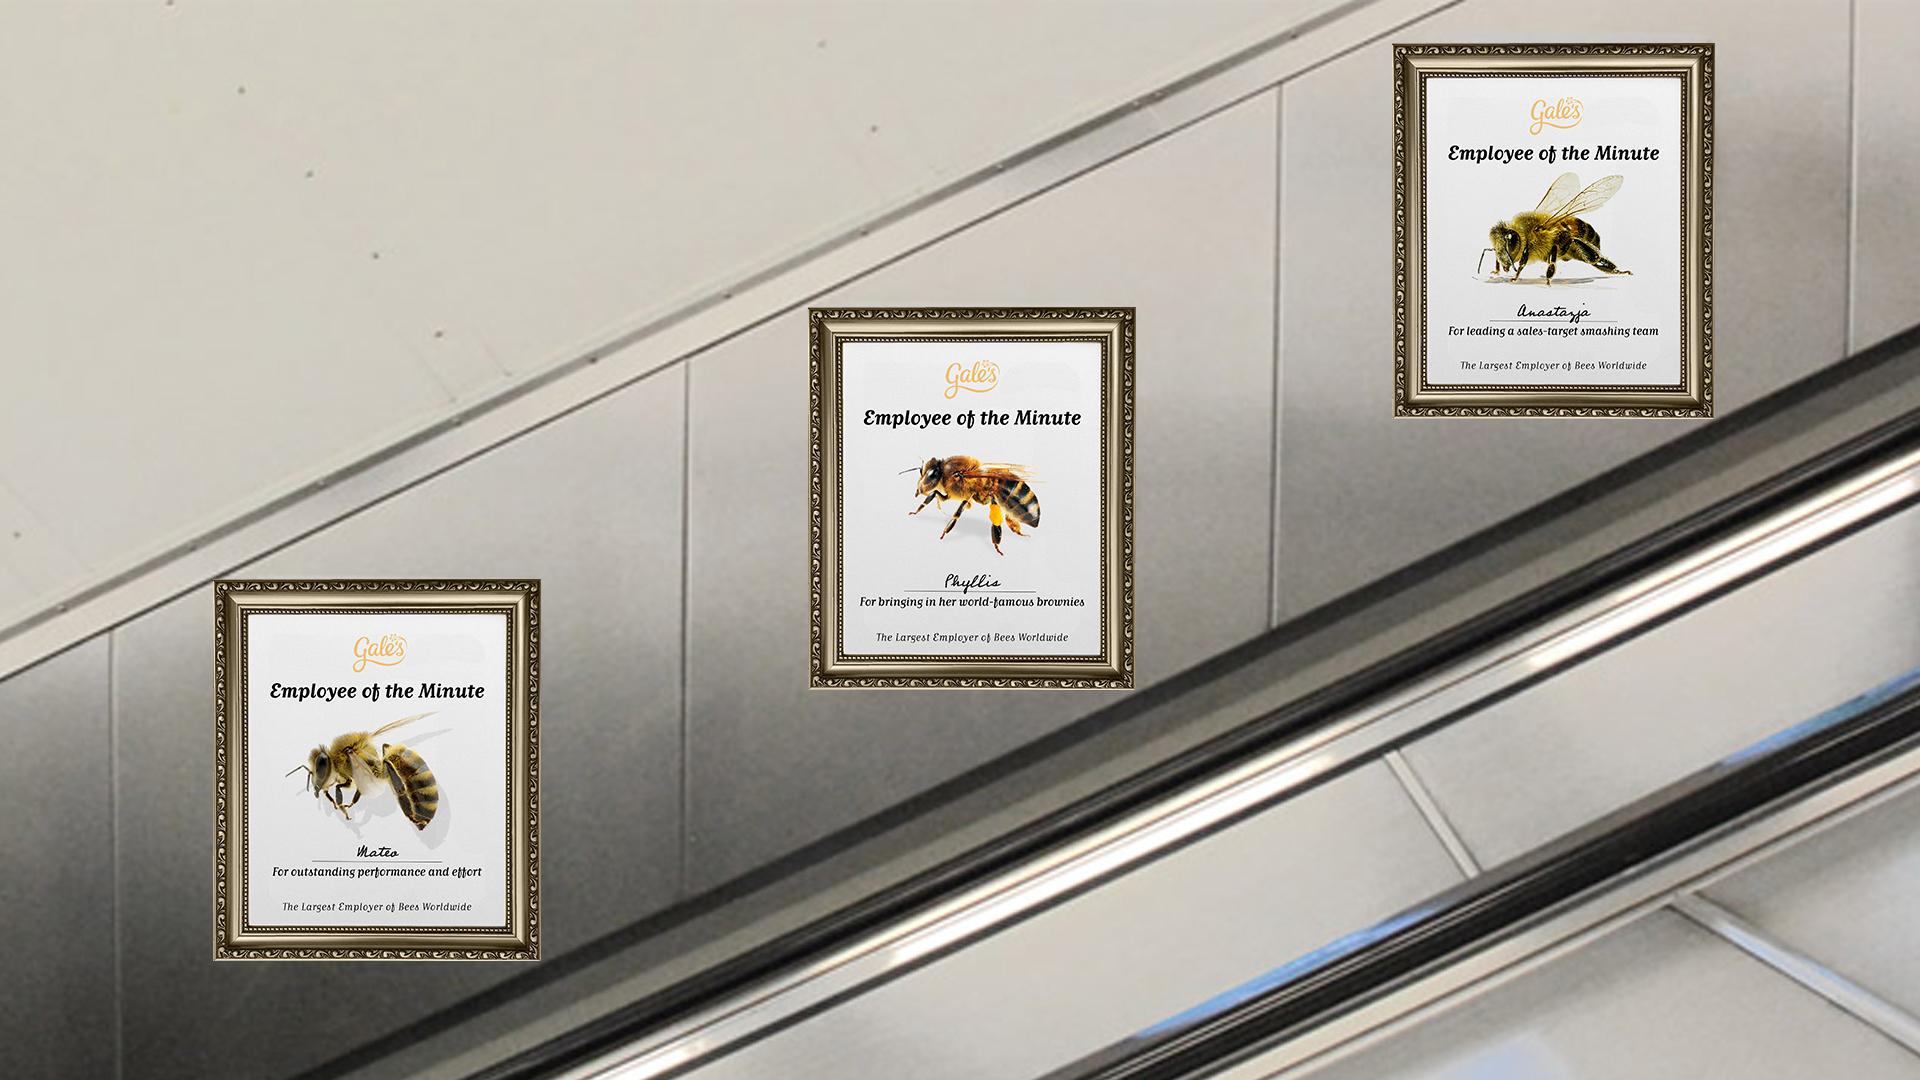 Digital posters on underground escalators